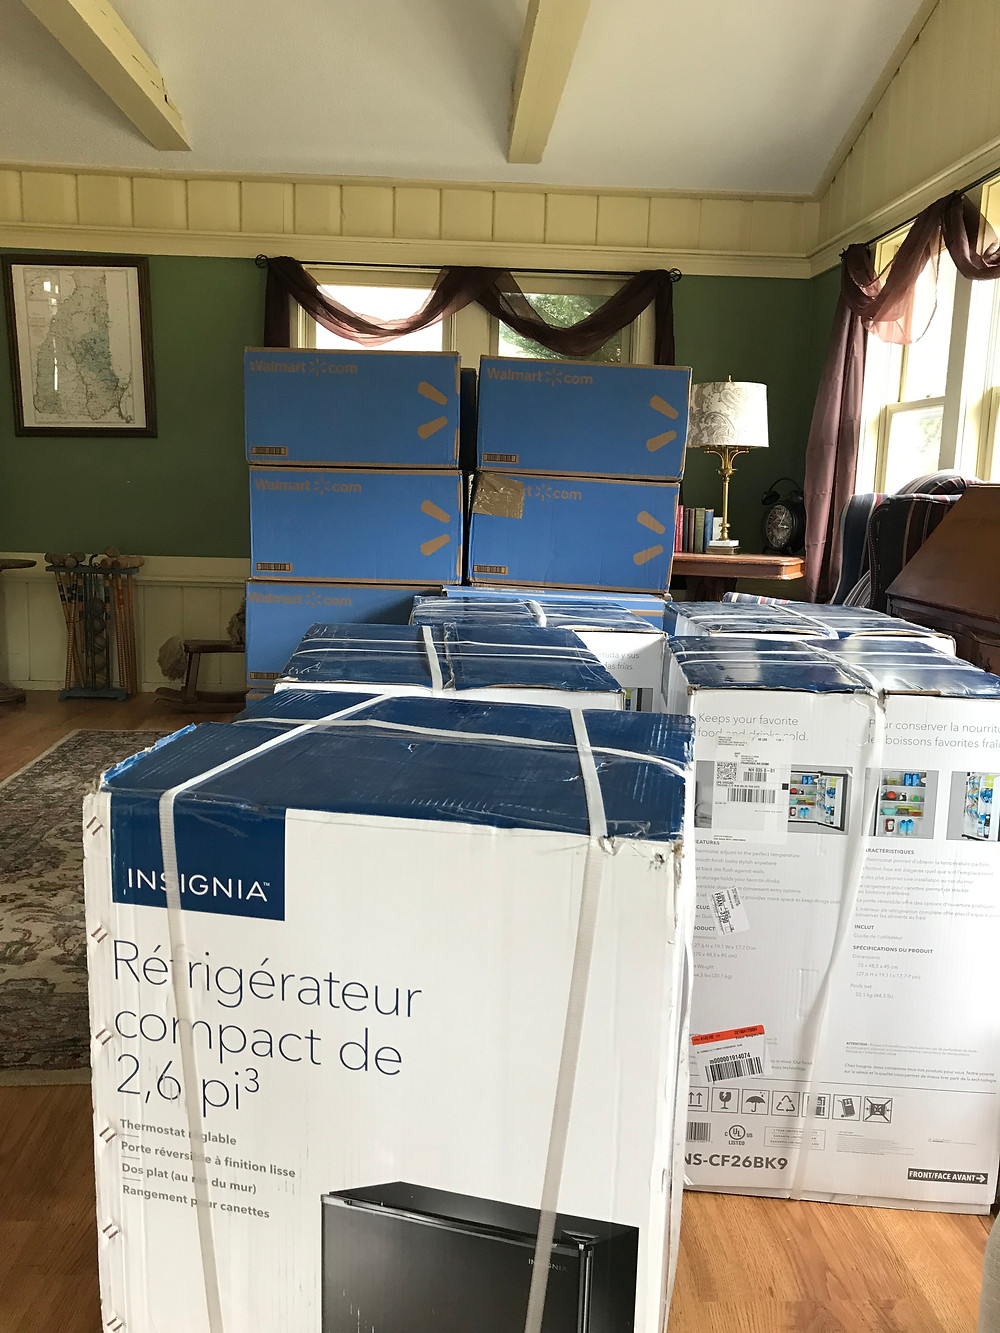 refigerator microwave every room Lovetts Inn